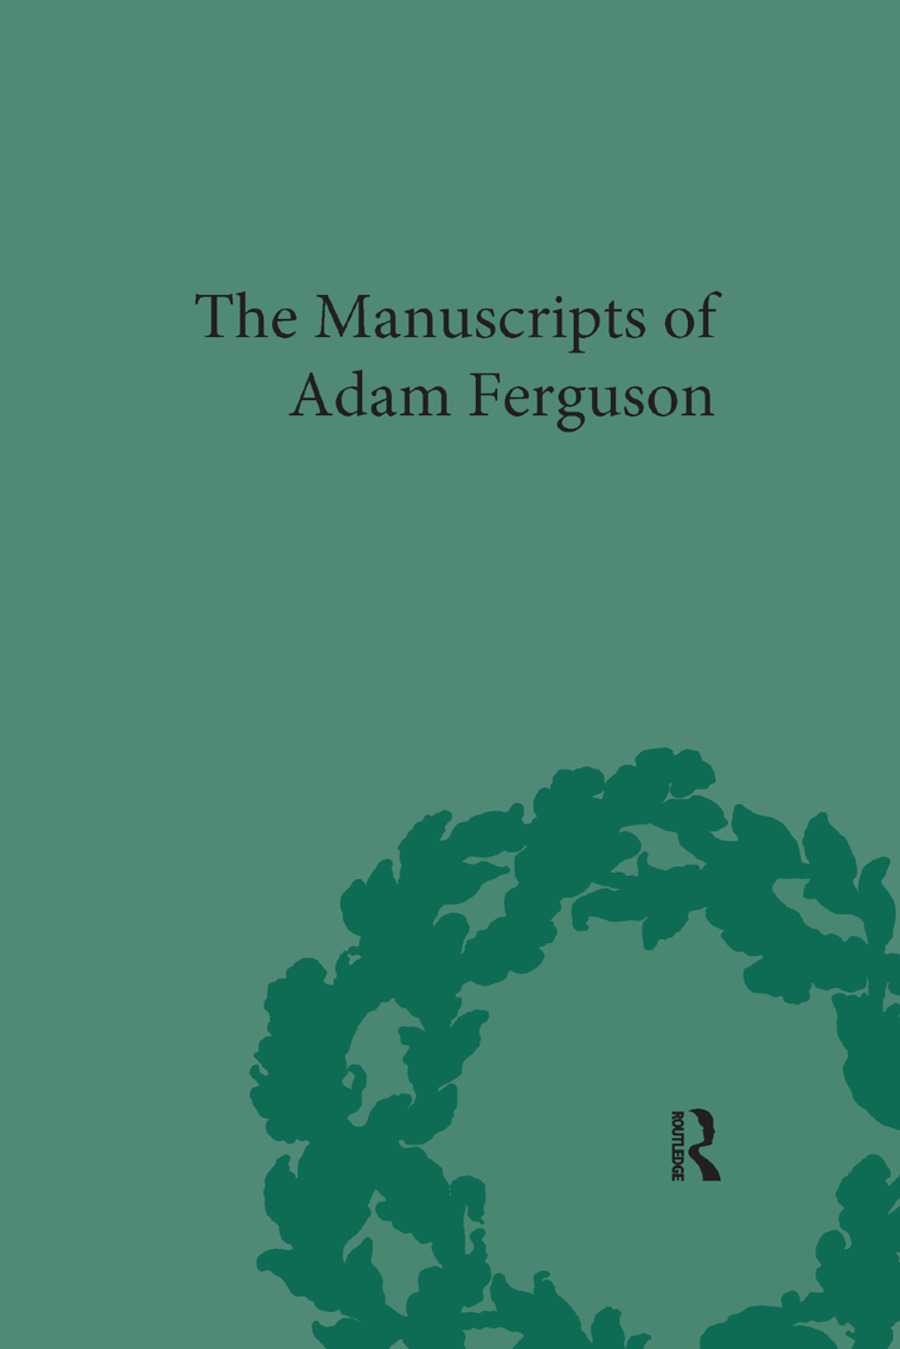 The Manuscripts of Adam Ferguson book cover